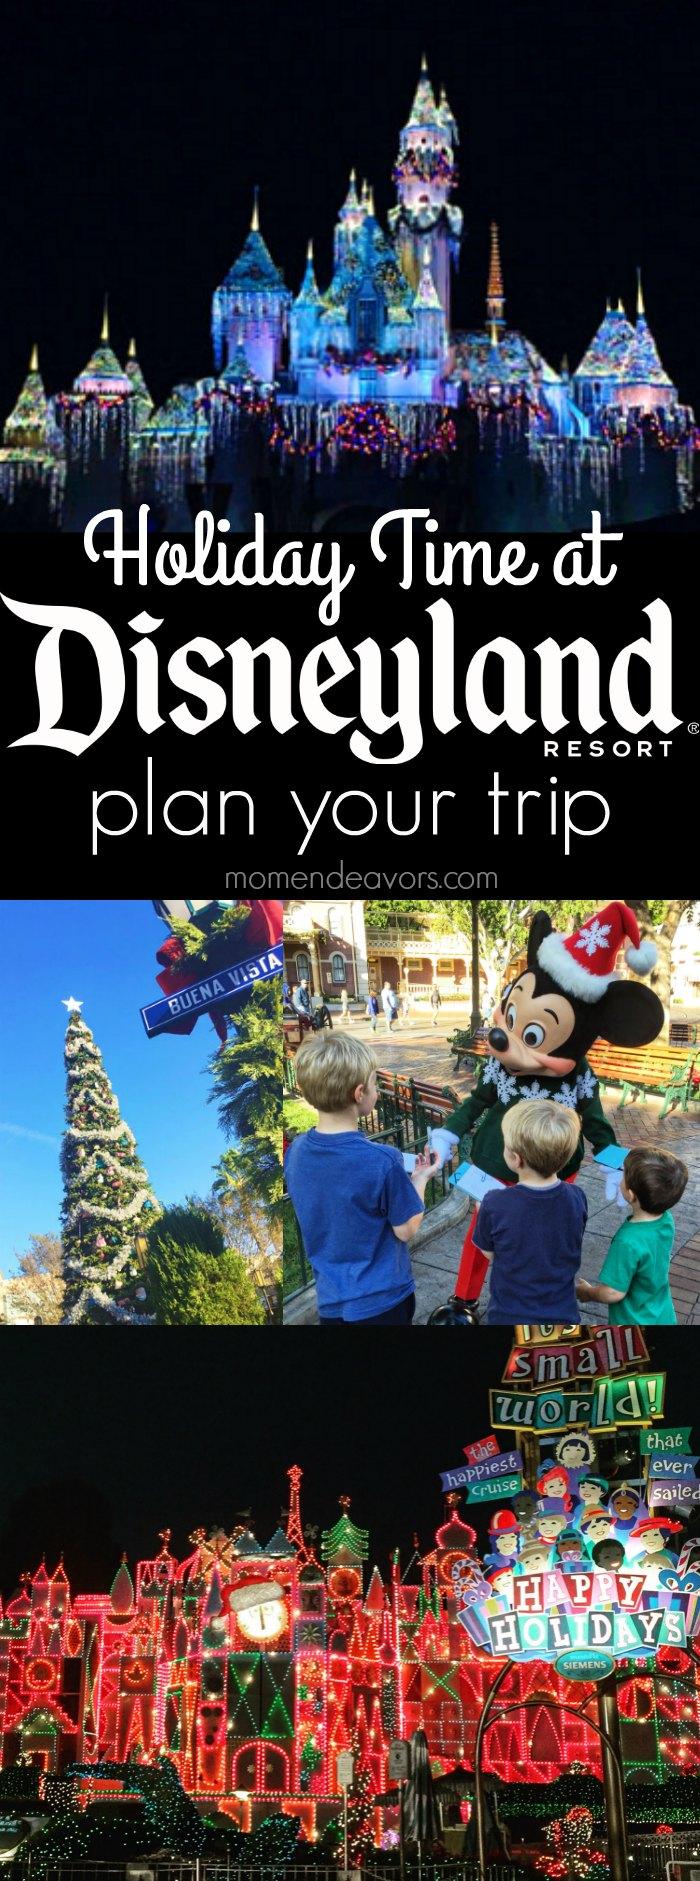 Holidays At Disneyland Resort Reasons To Plan A Visit